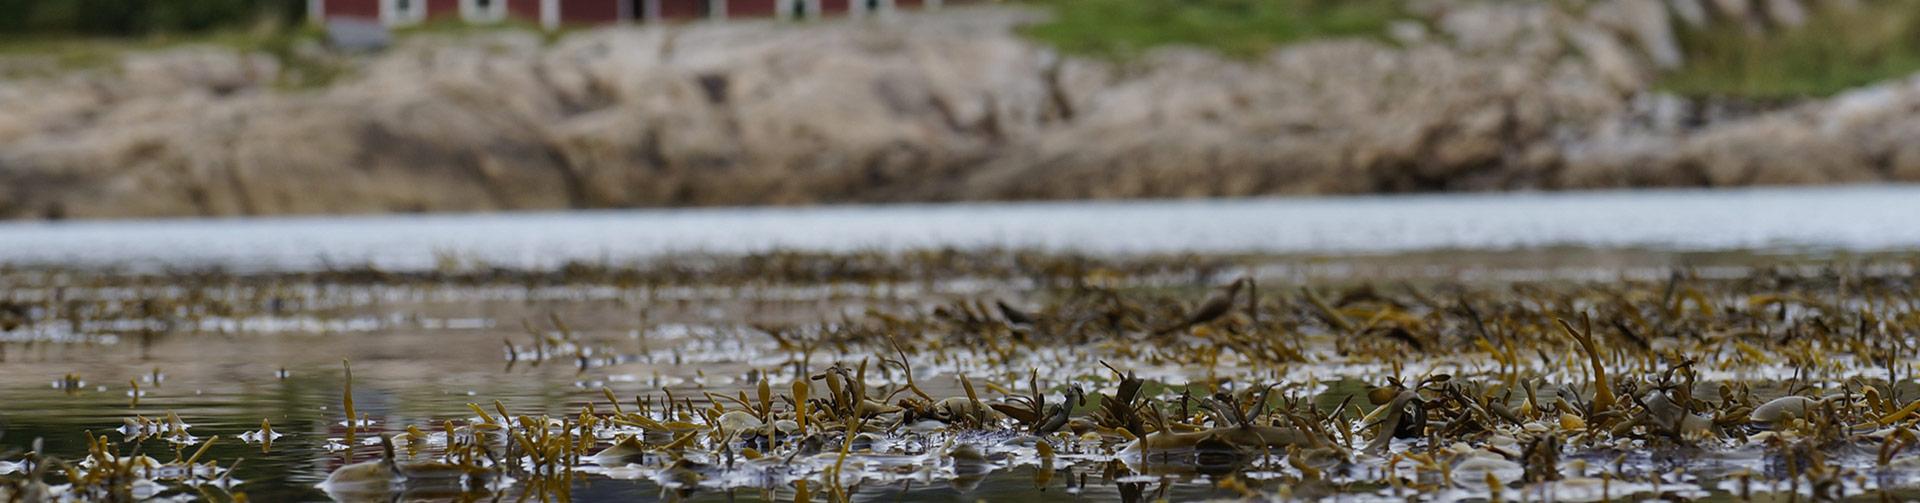 Algea collects and processes algae like Ascophyllum nodosum